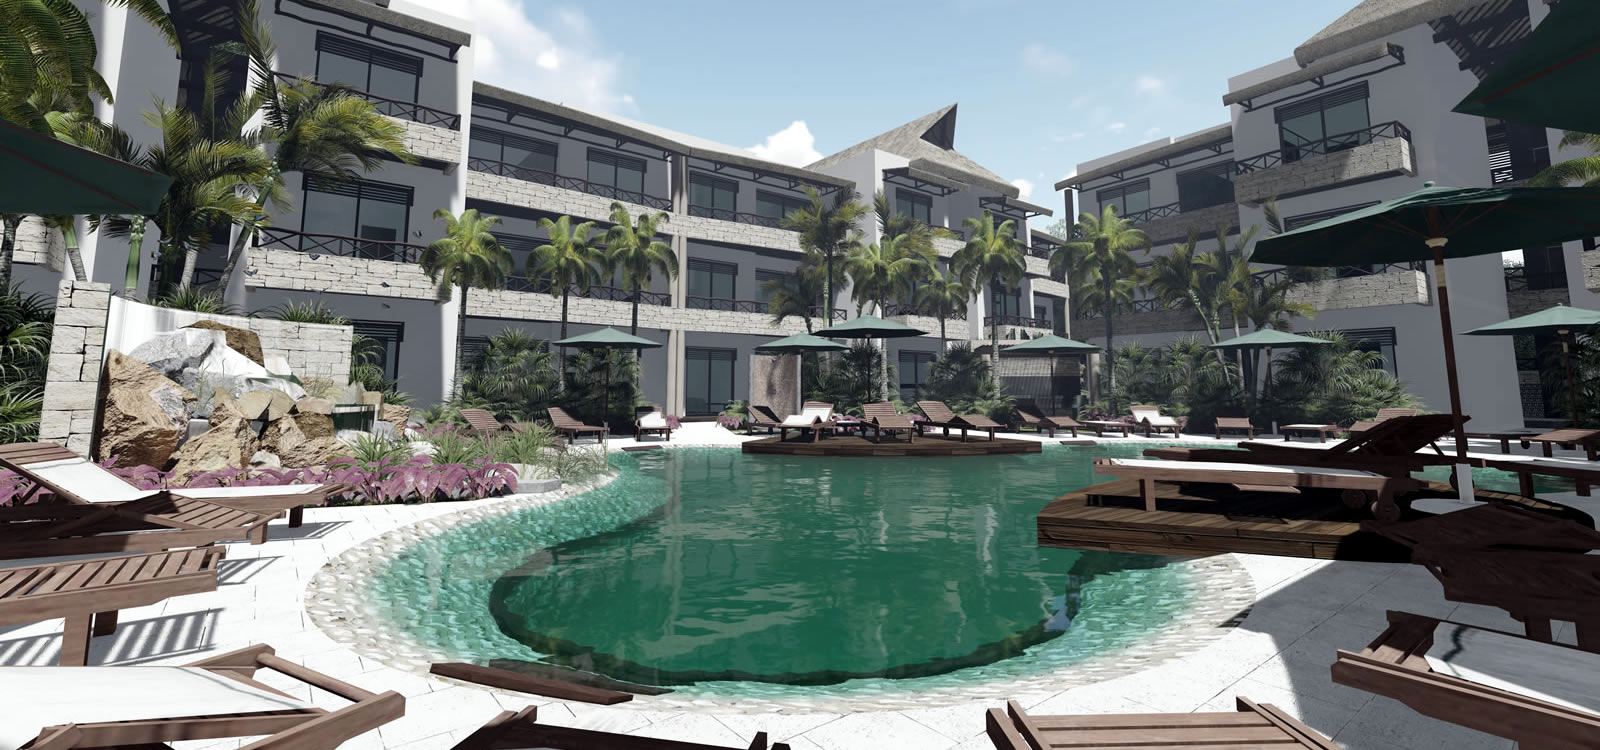 Incredible Studio Condos For Sale Downtown Tulum Quintana Roo Interior Design Ideas Gentotthenellocom